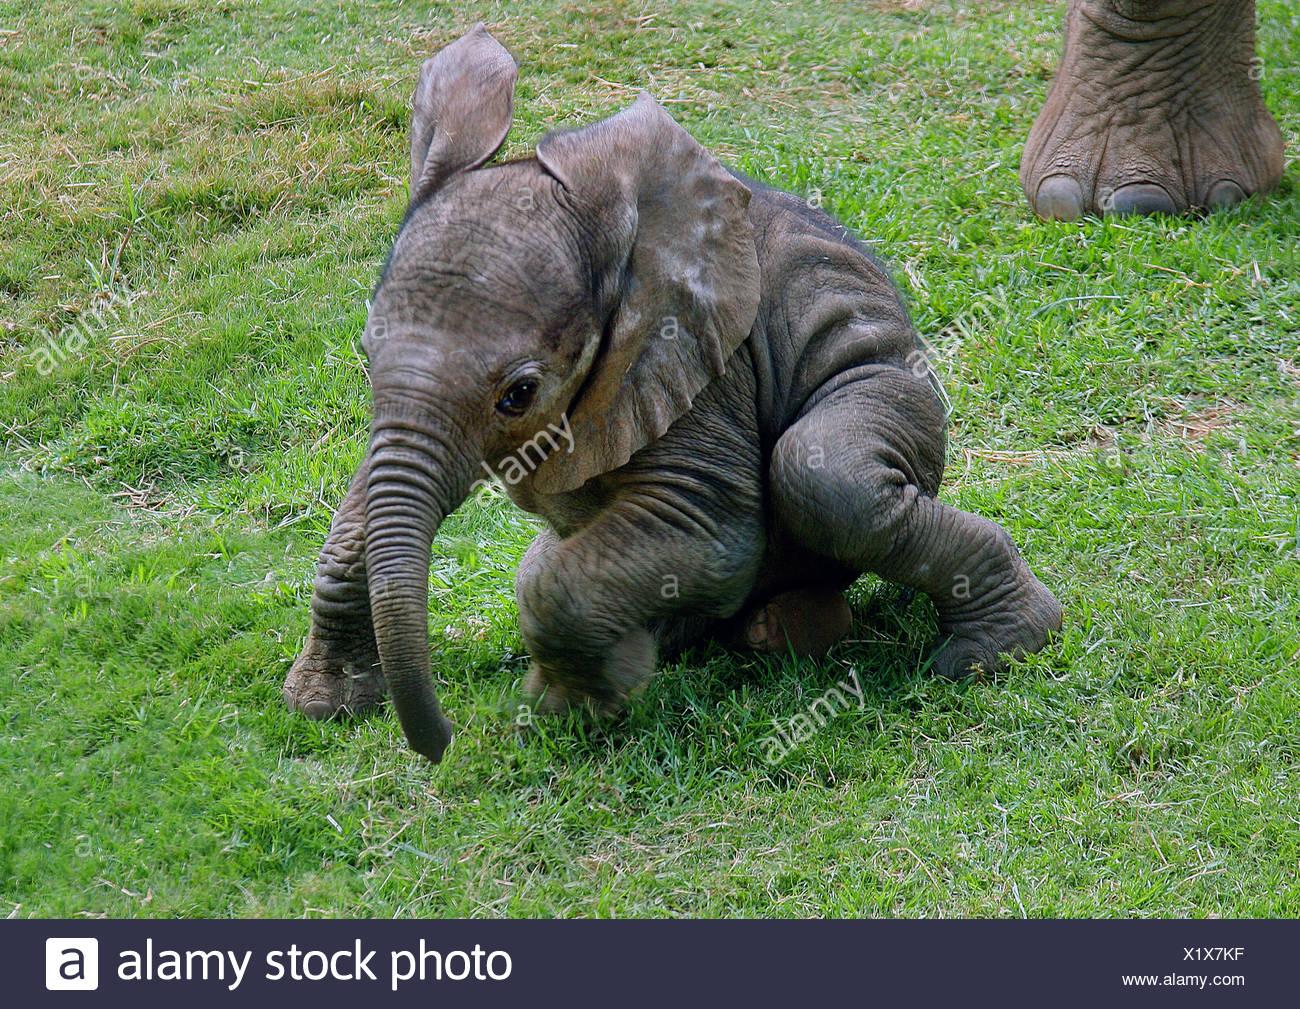 Elefante africano (Loxodonta africana), baby elephant in un prato, Kenya, Amboseli National Park Immagini Stock